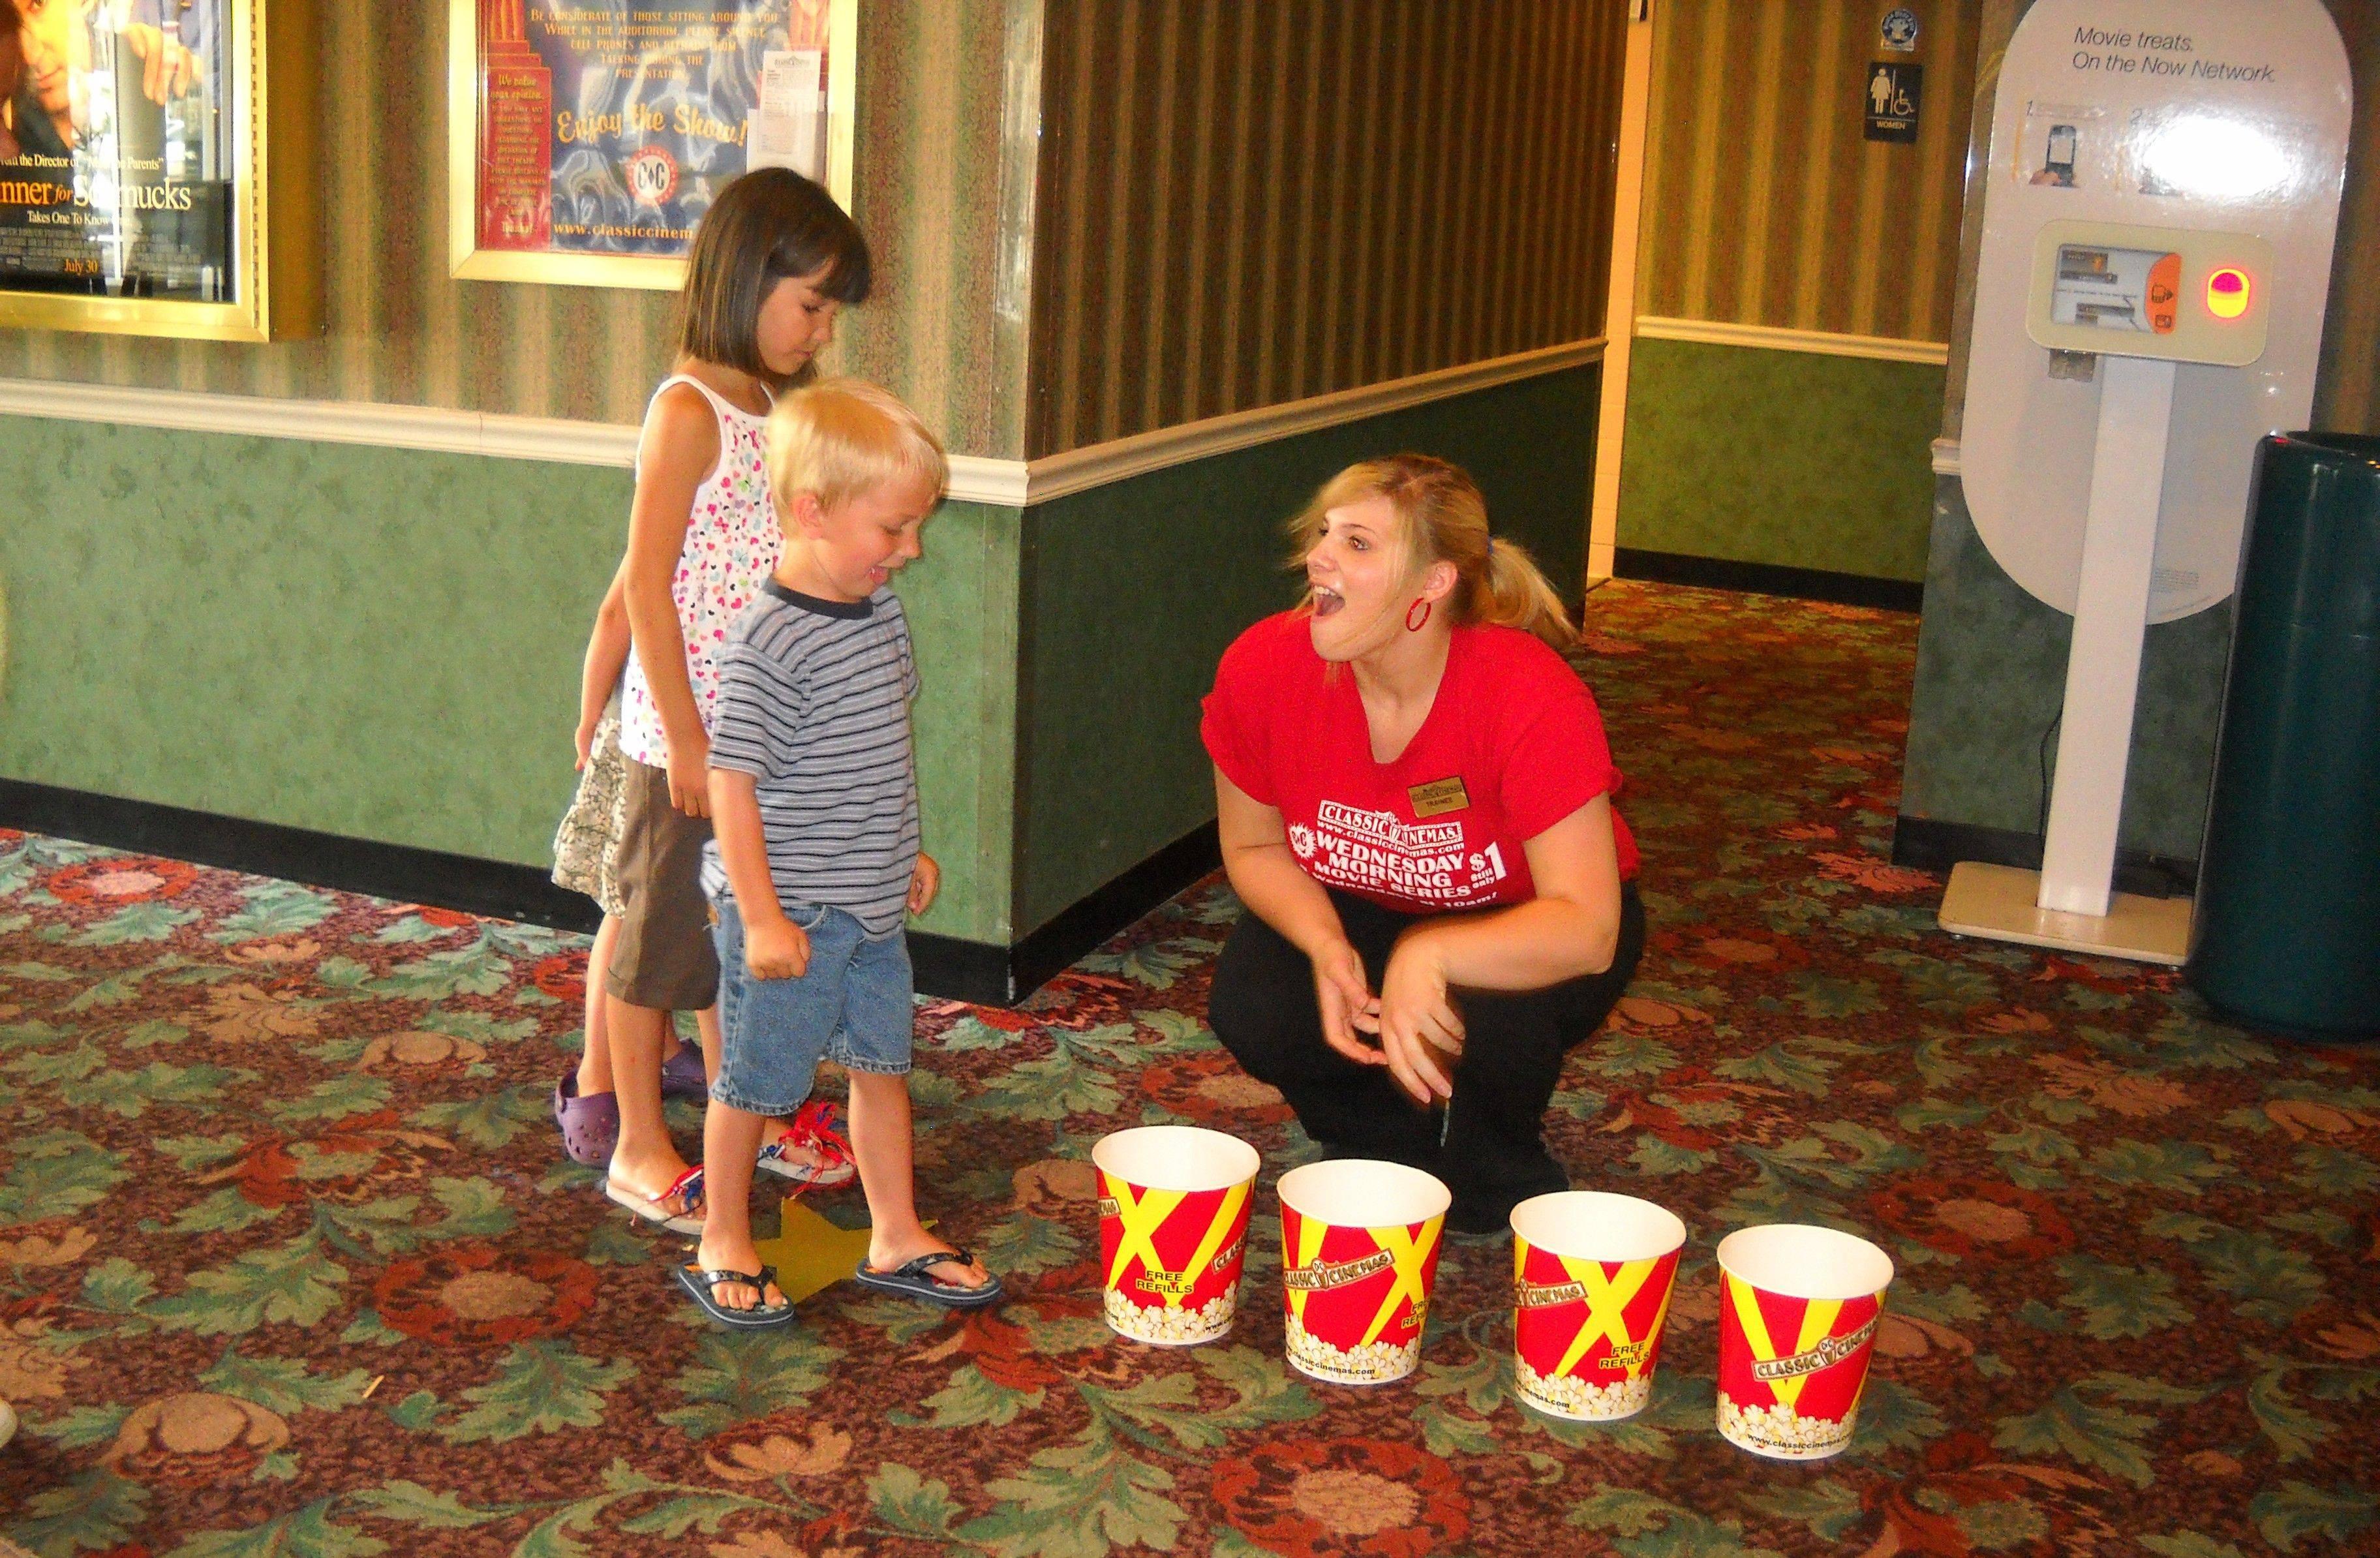 cineplexes offering cheap kiddie matinees this summer